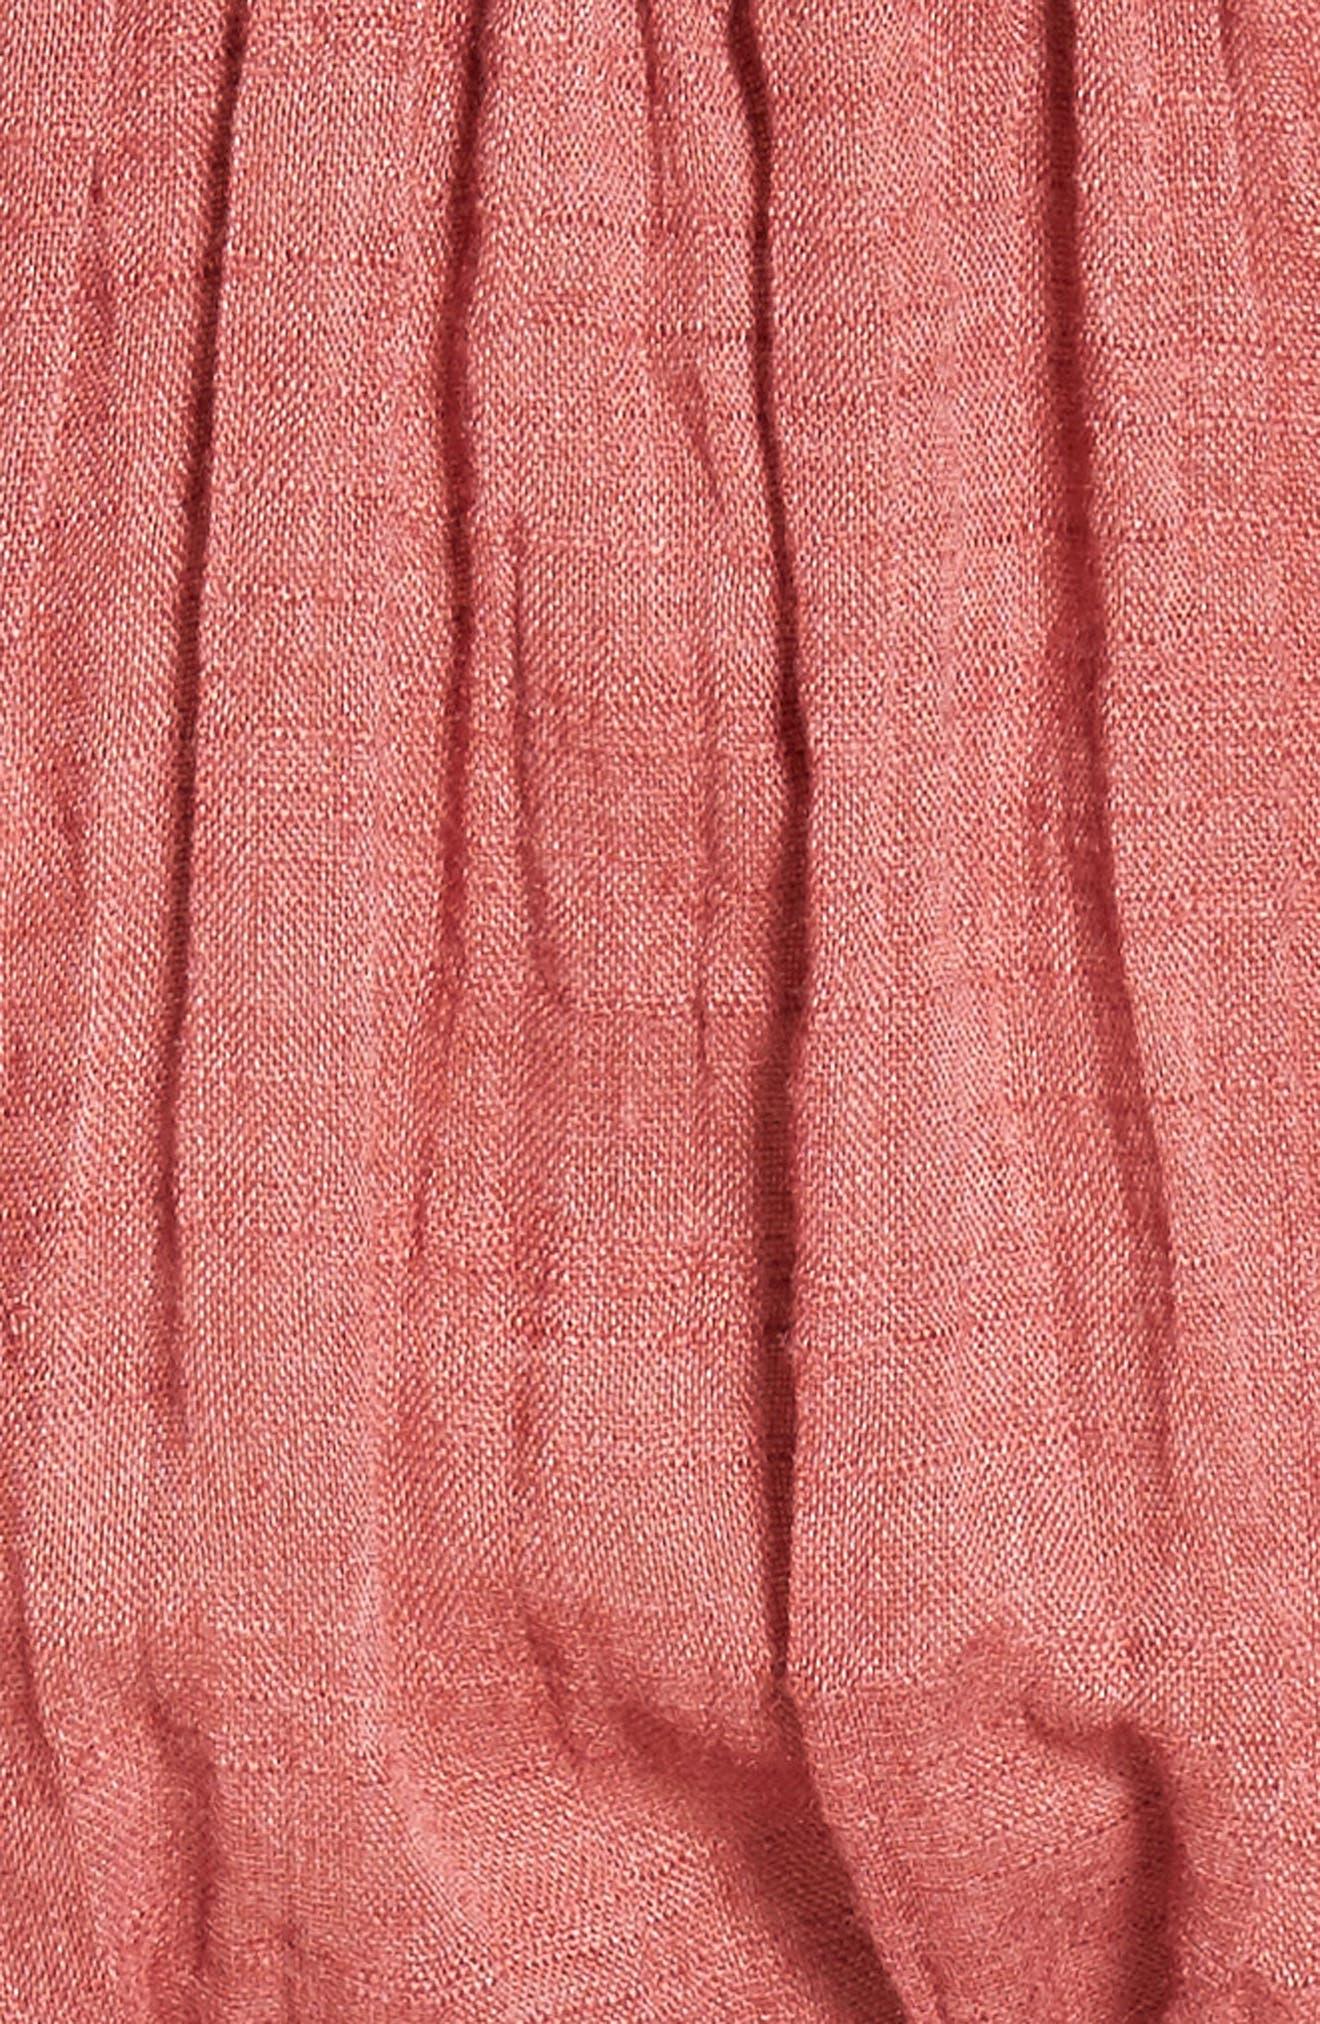 Darla Off the Shoulder Minidress,                             Alternate thumbnail 5, color,                             Brick